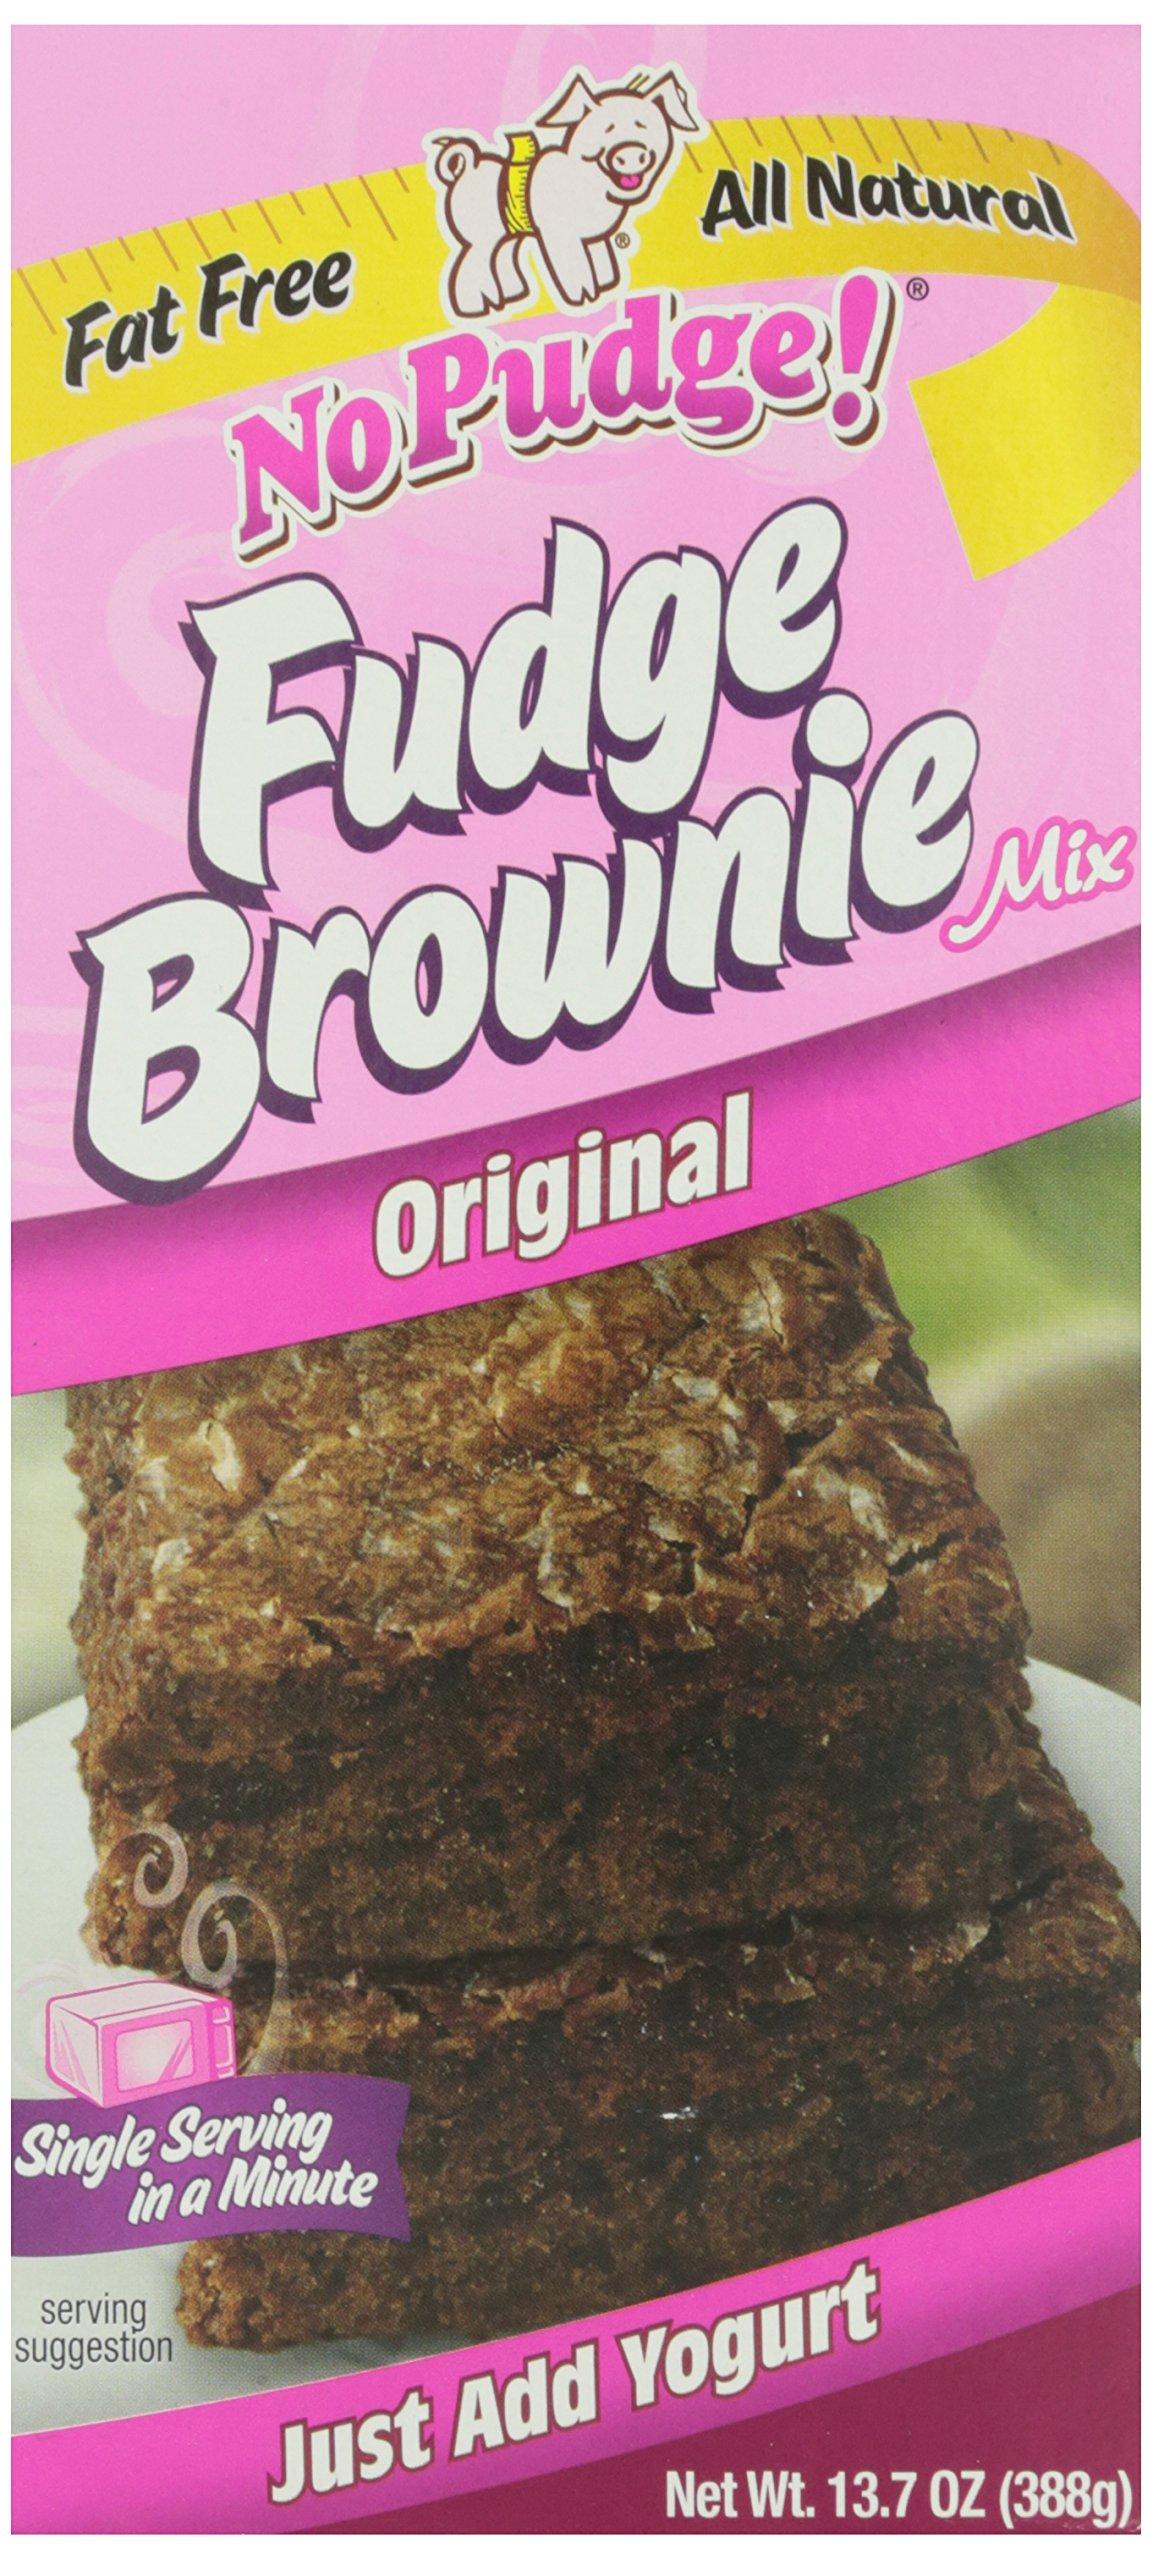 No Pudge, Fat Free Fudge Brownie Mix, Original, 13.7 oz